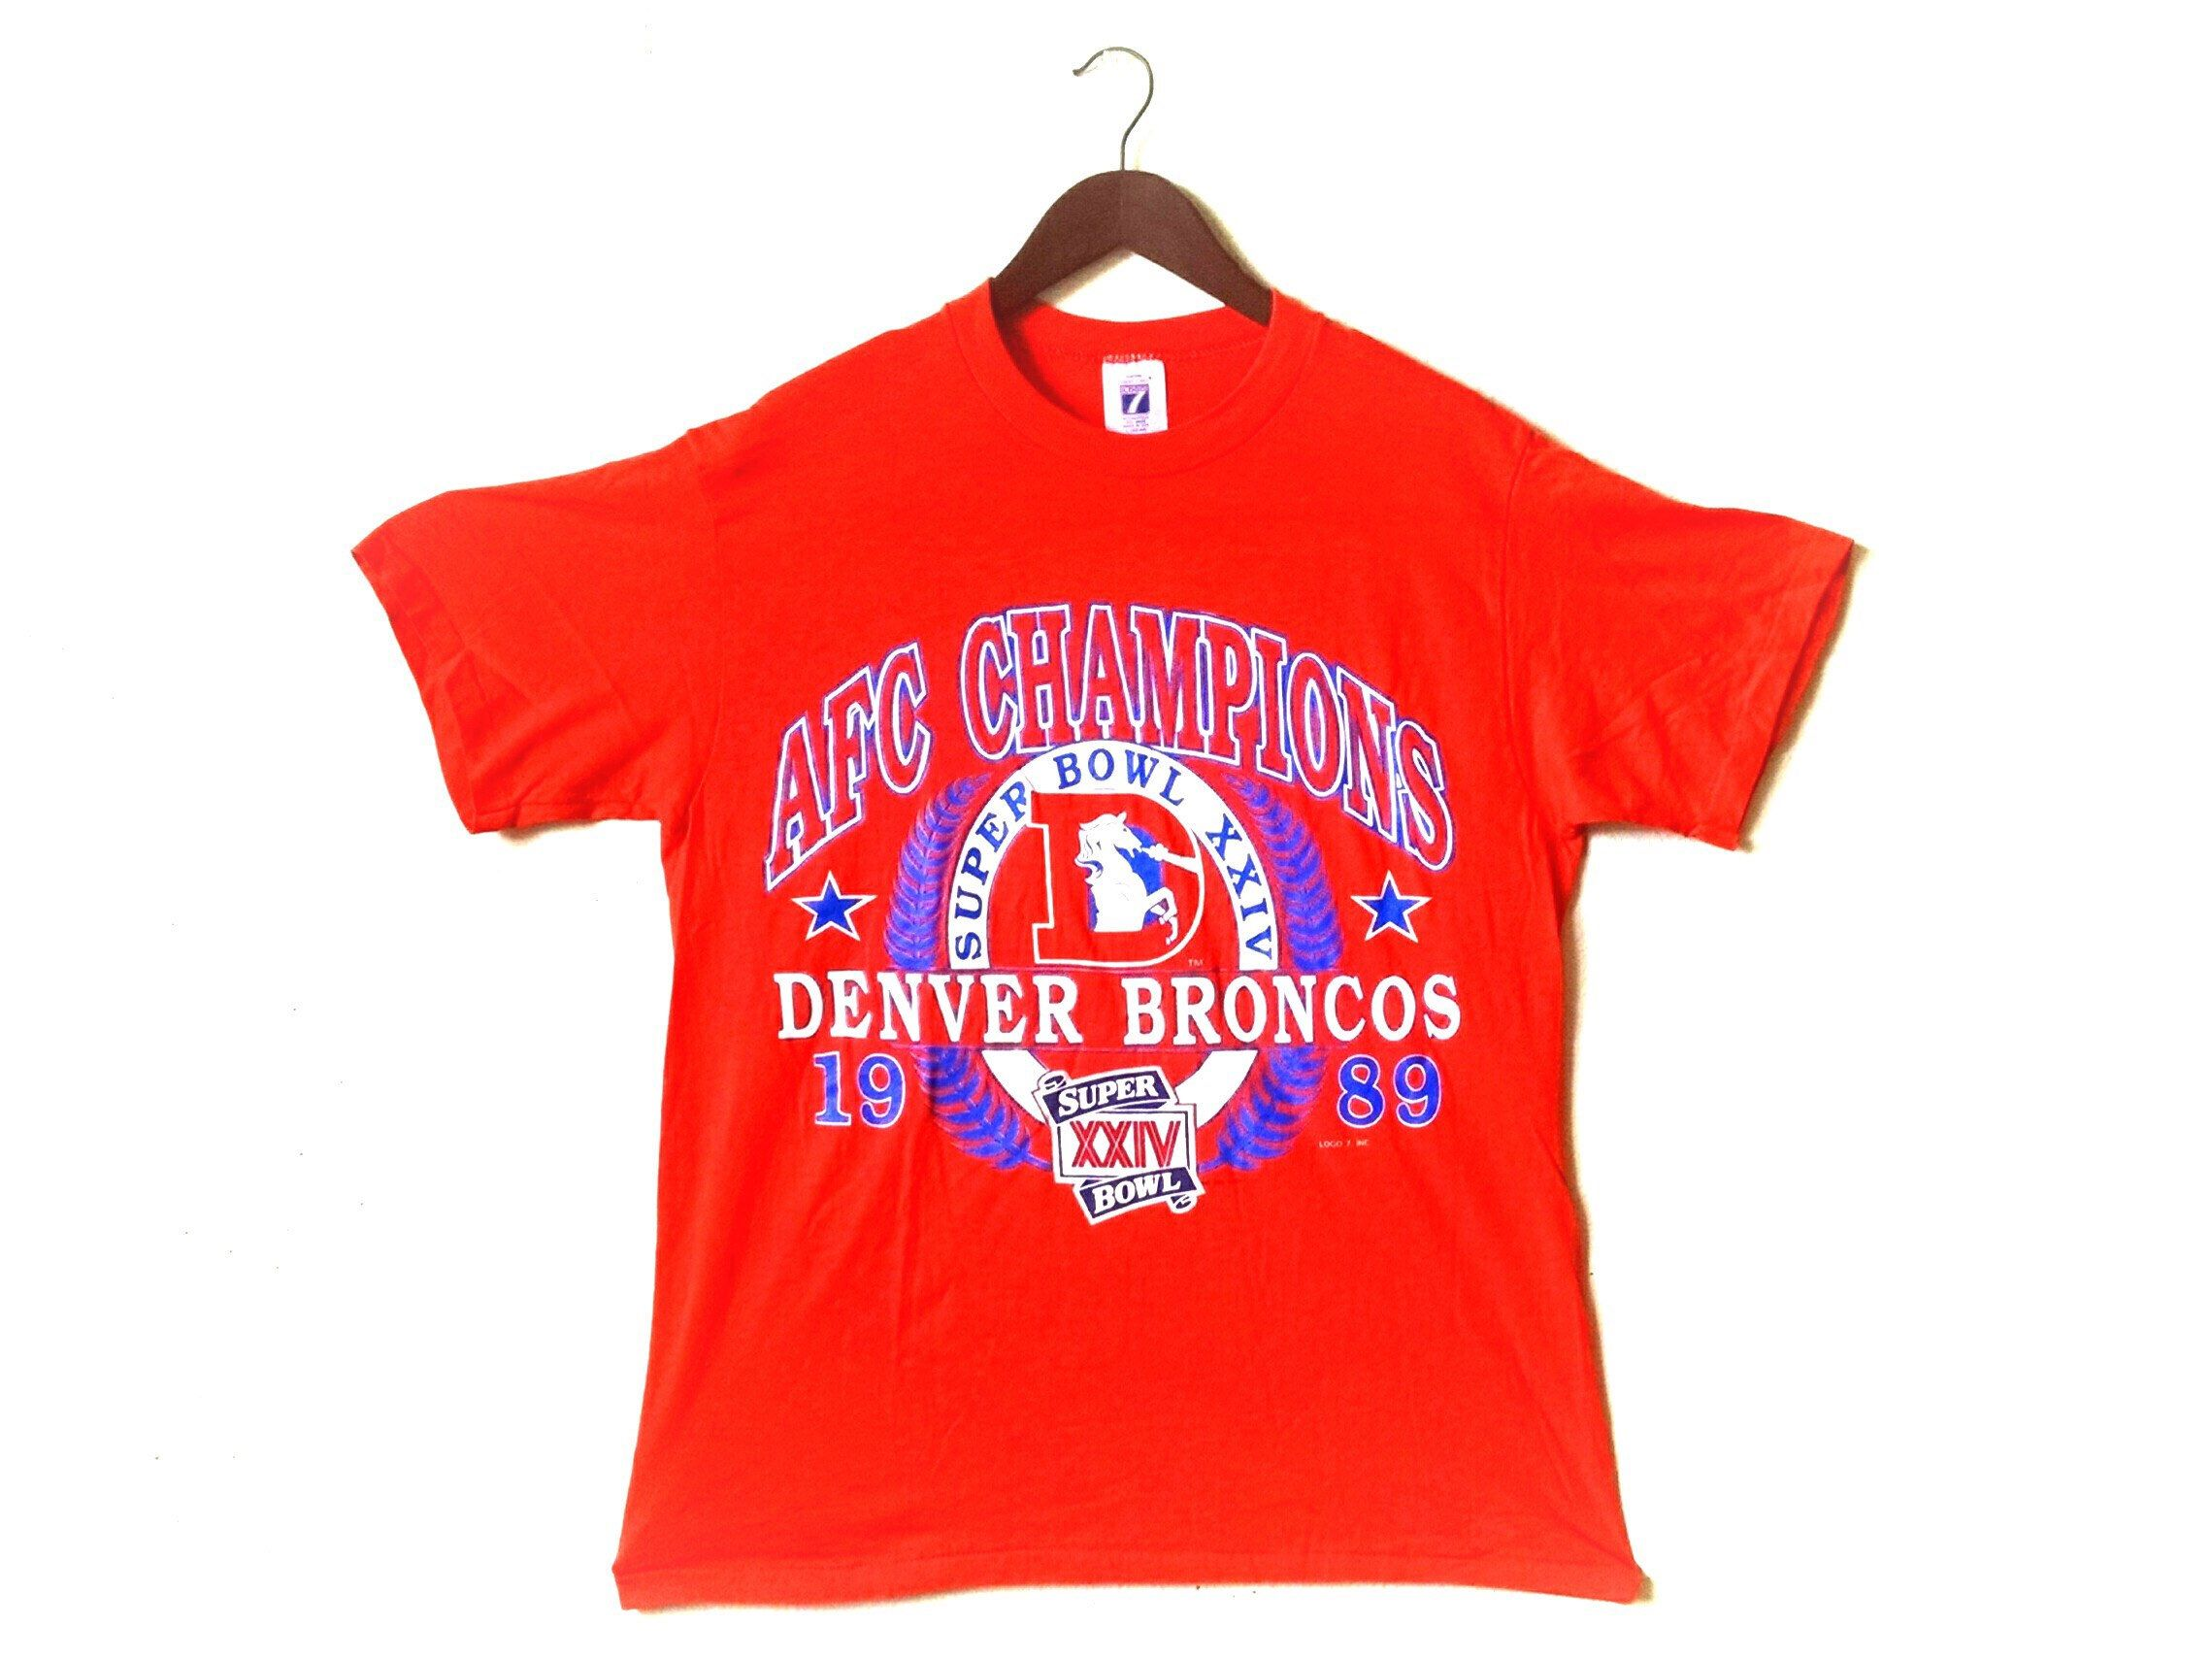 denver broncos afc championship shirts